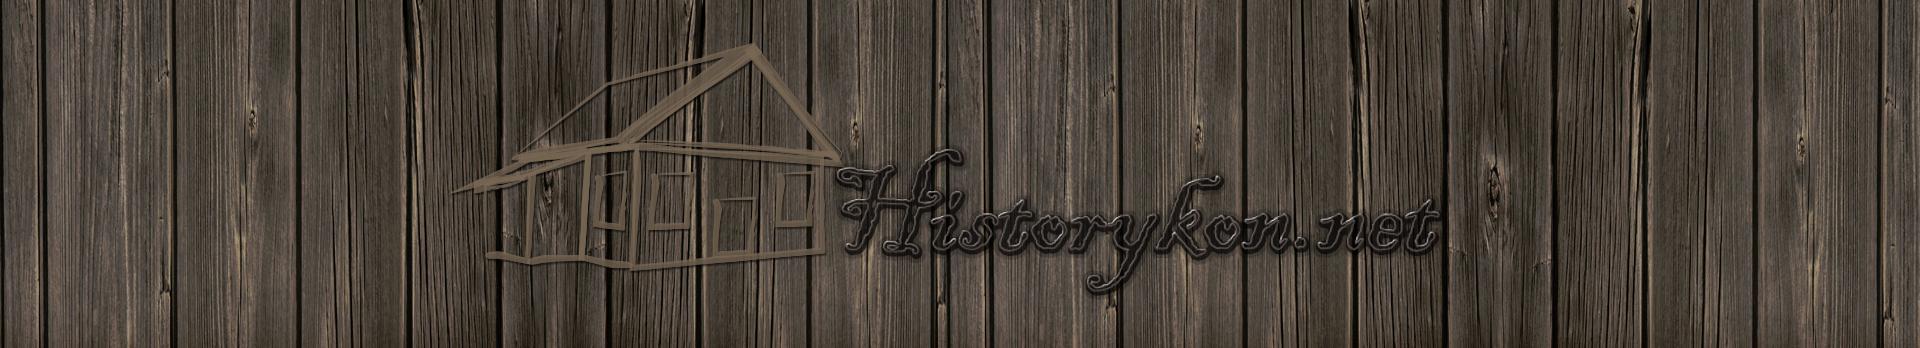 Historykon